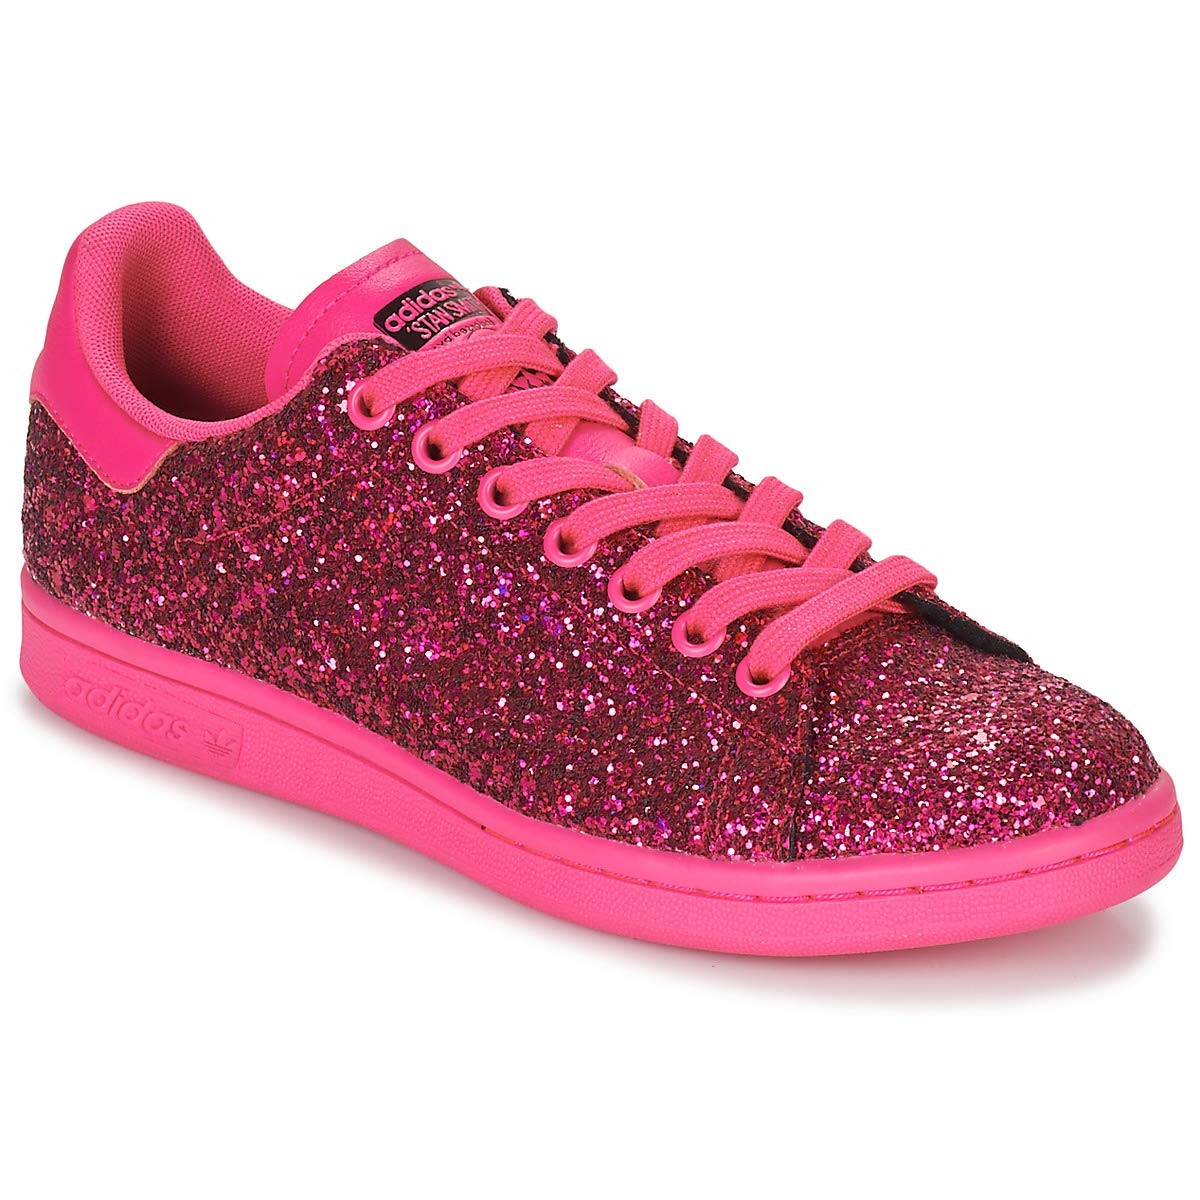 Adidas Originals Stan Smith W Turnschuhe Damen Rosa Turnschuhe Low